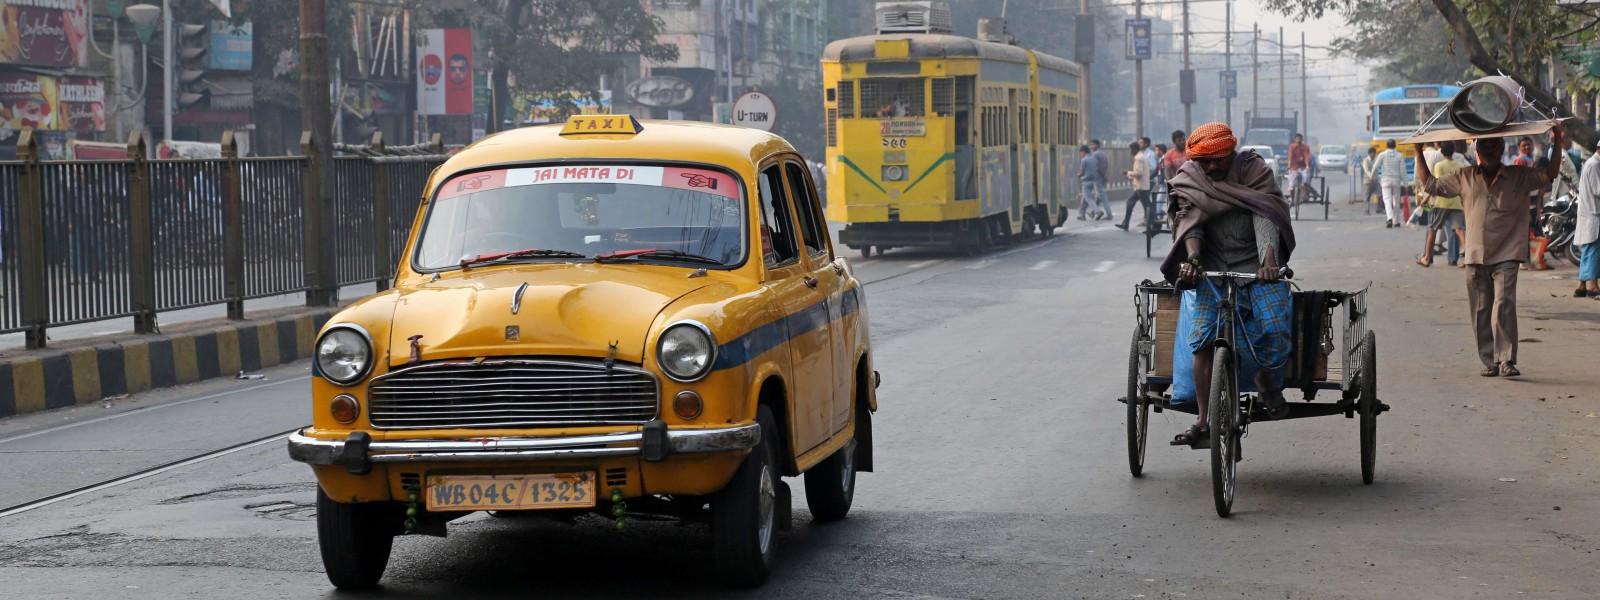 Calcutta-Tour-Guide